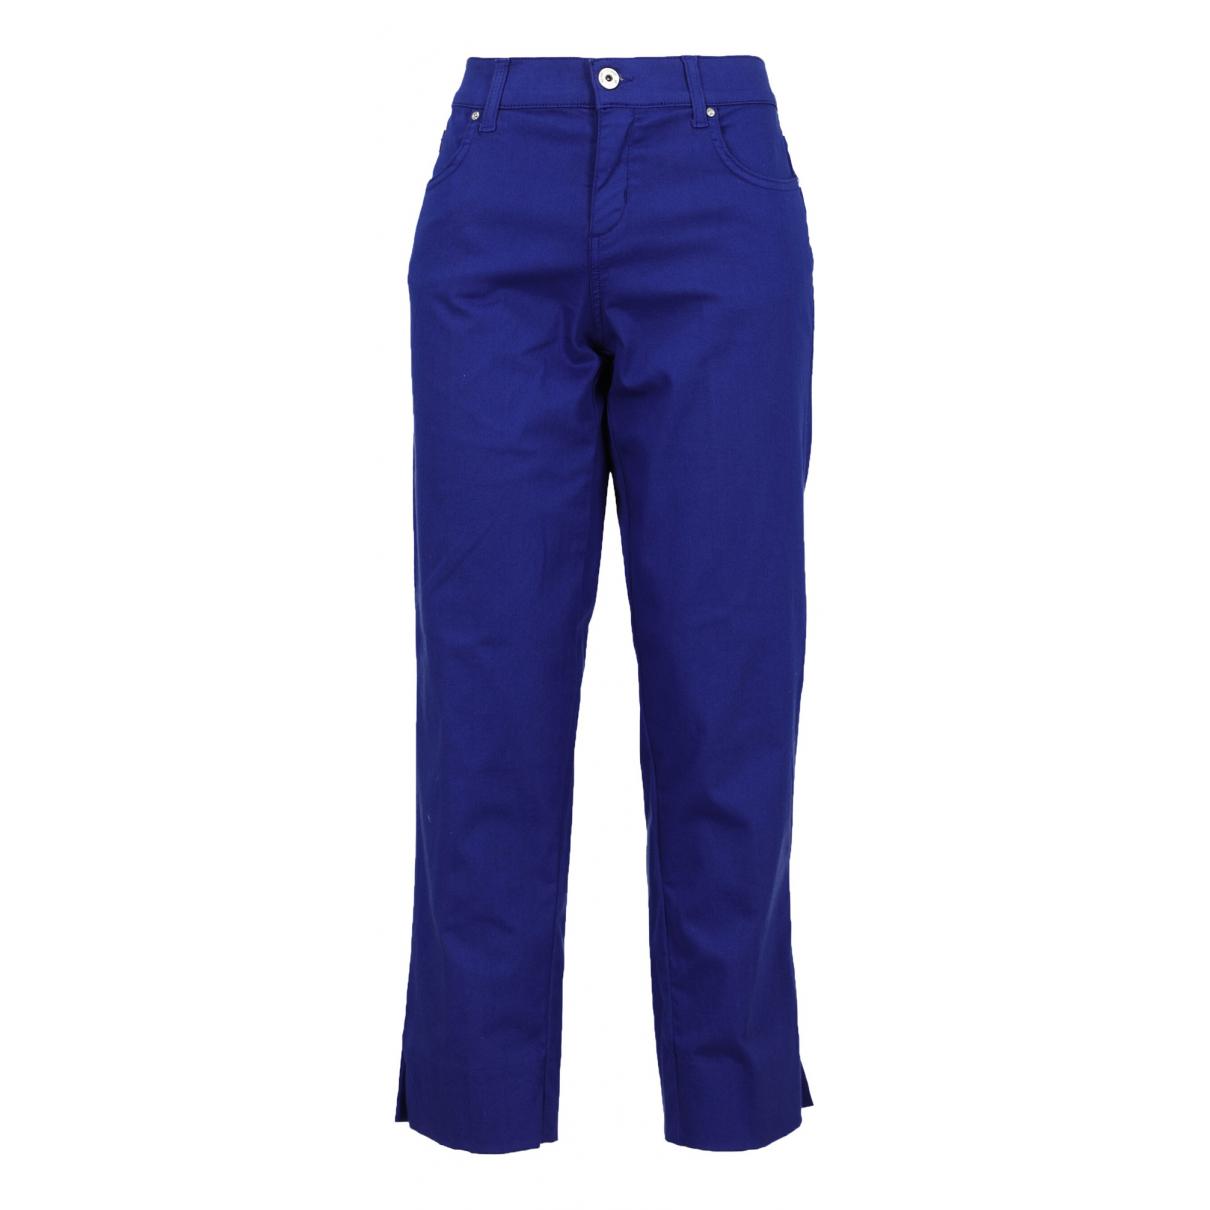 Pantalon en Algodon Azul Blumarine